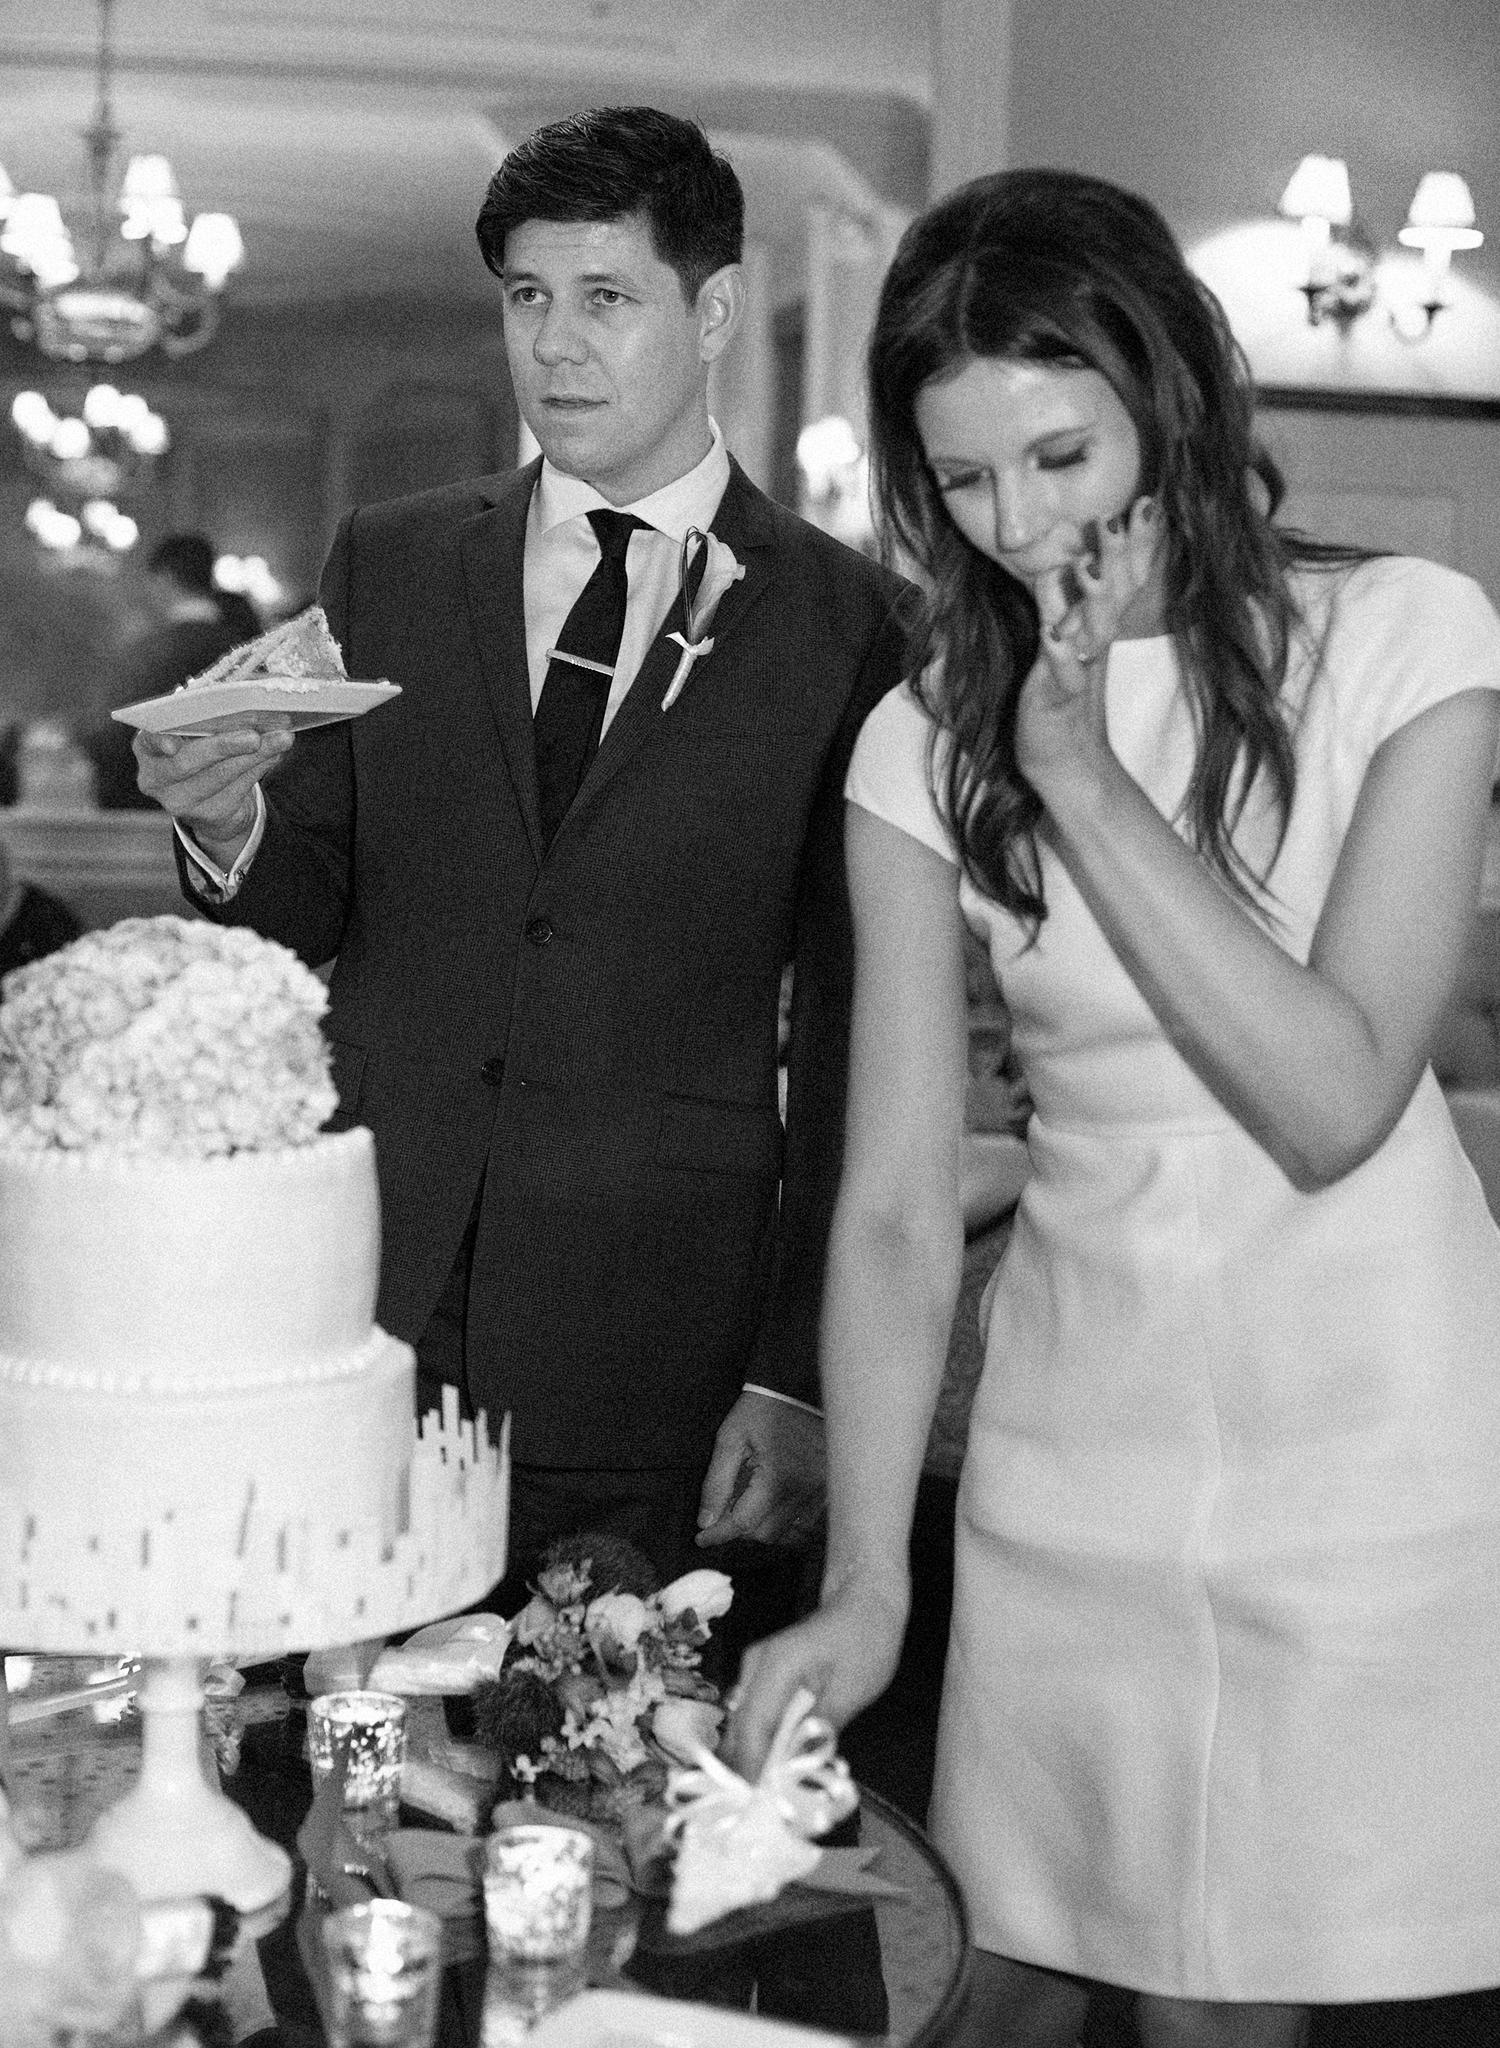 39-funny-cake-cutting.jpg